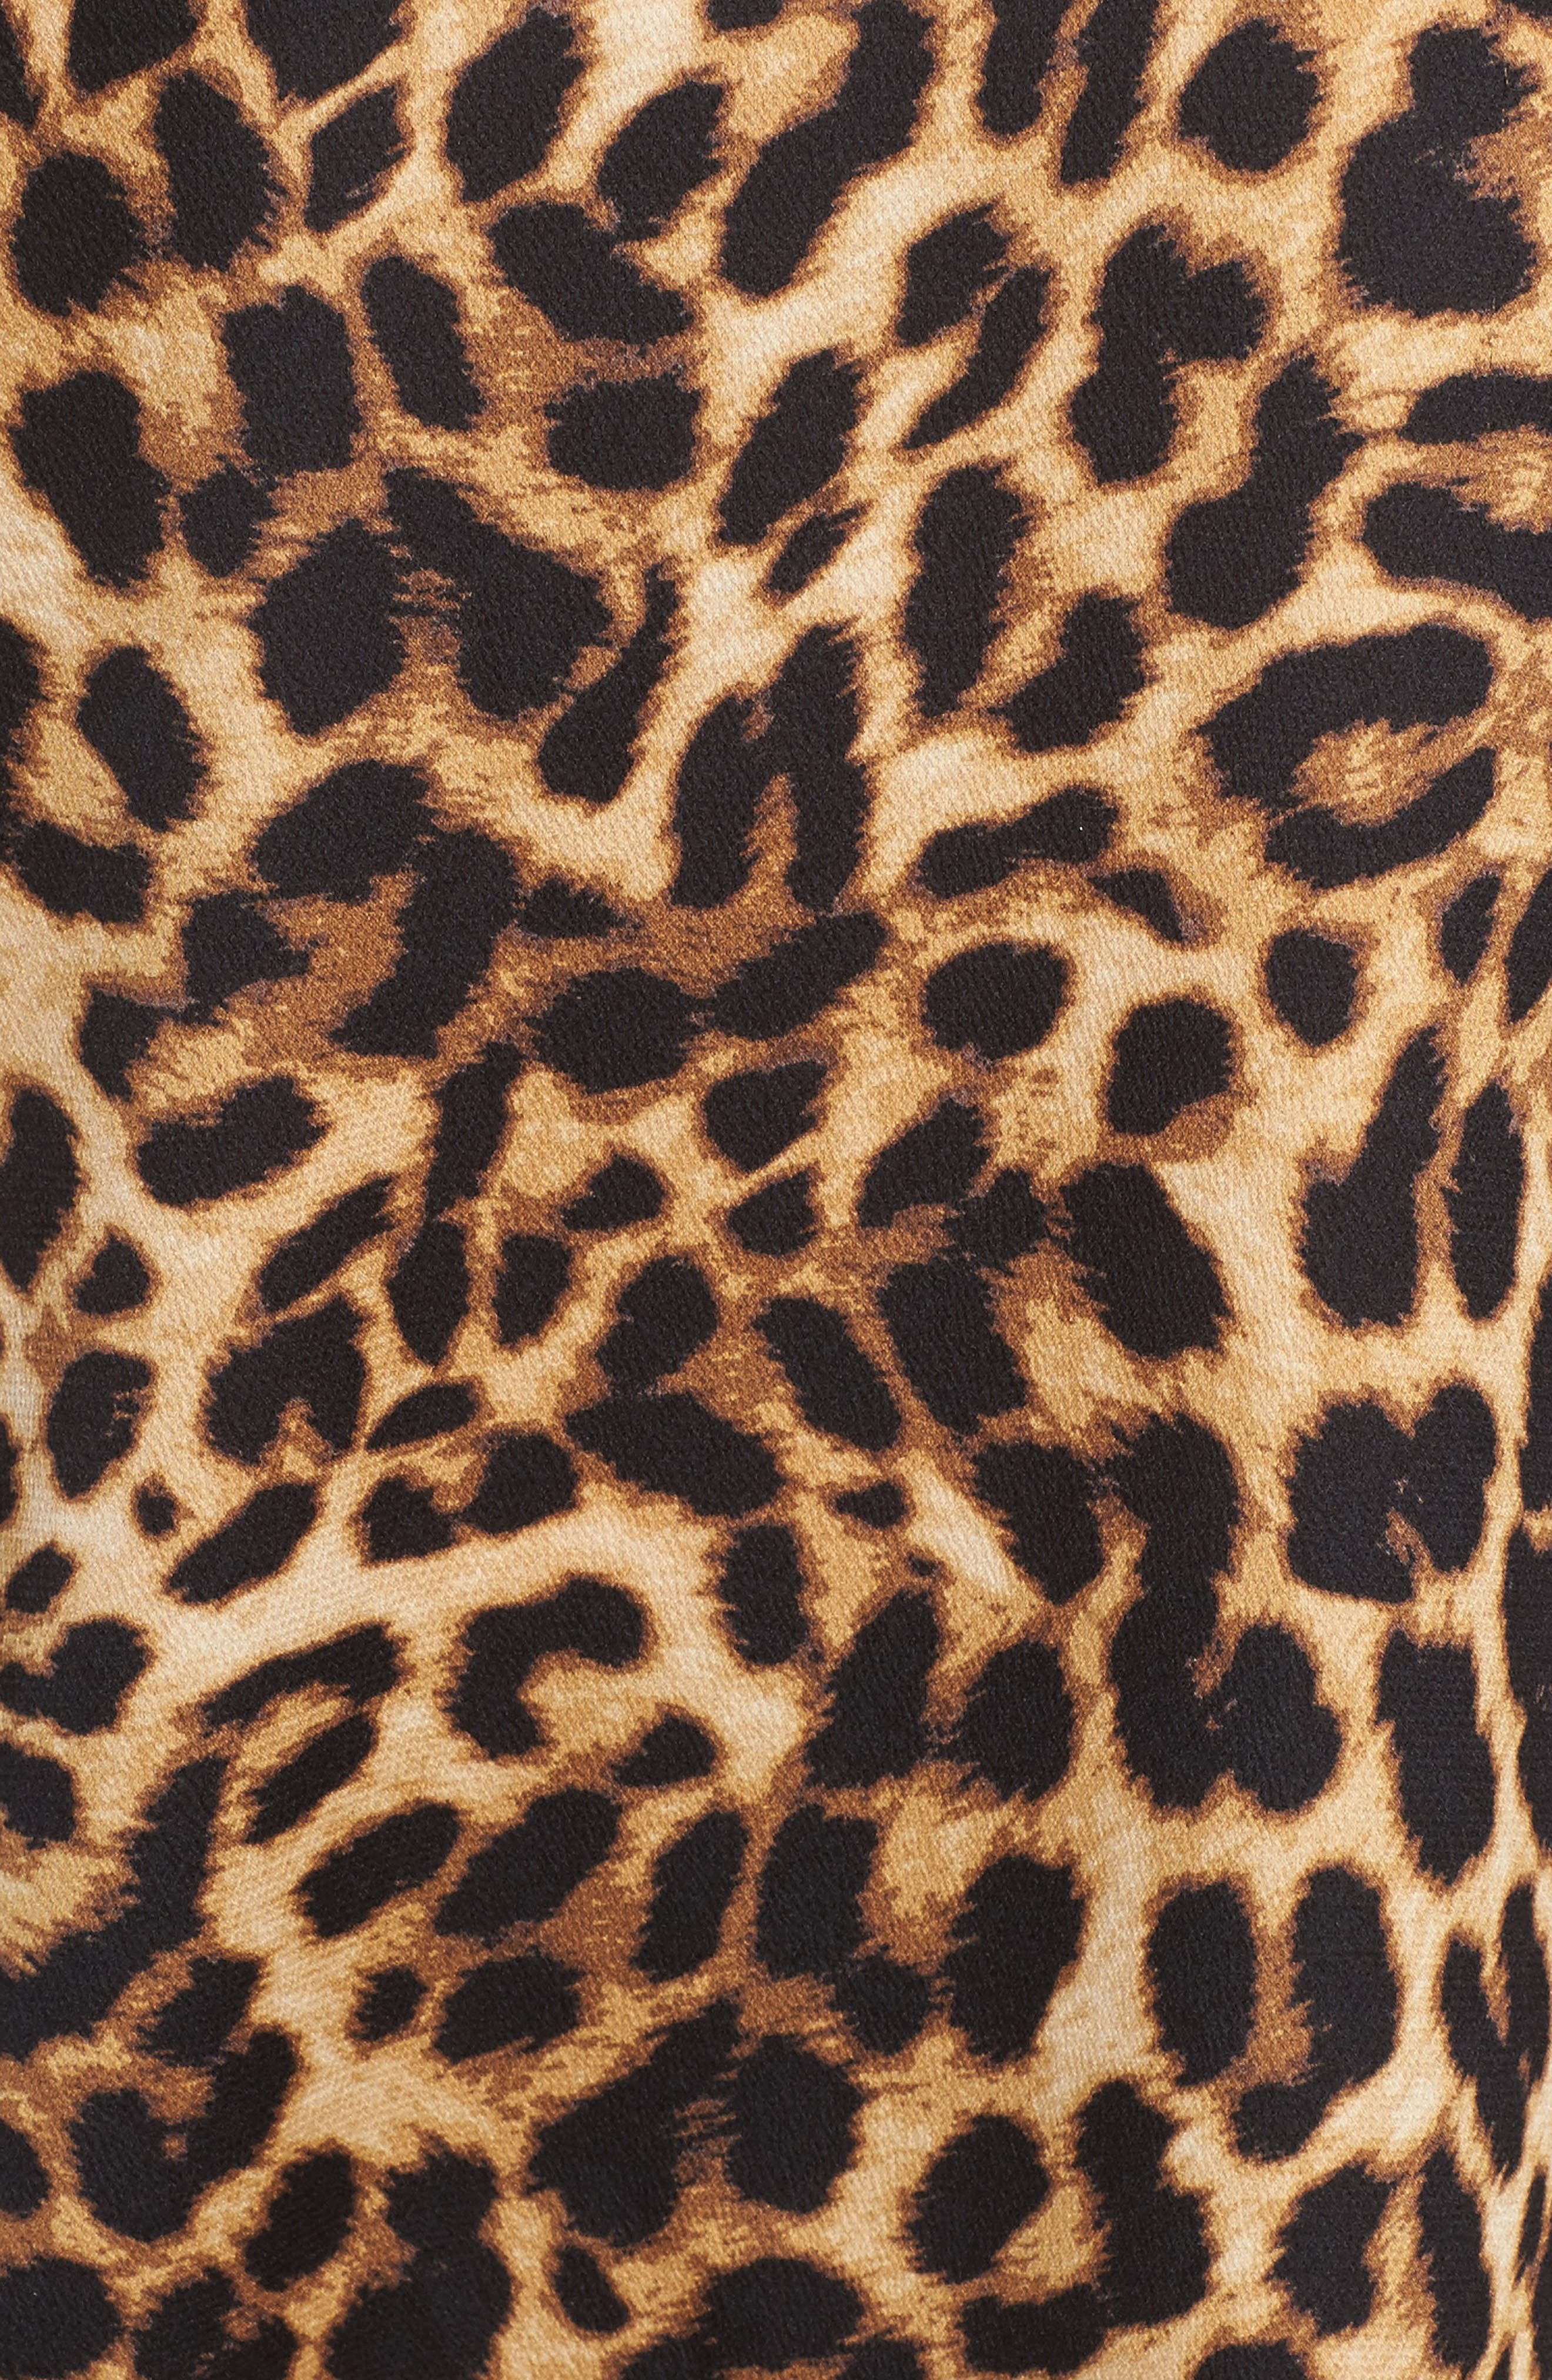 Mock Choker Neck Leopard Print Top,                             Alternate thumbnail 5, color,                             Rich Black